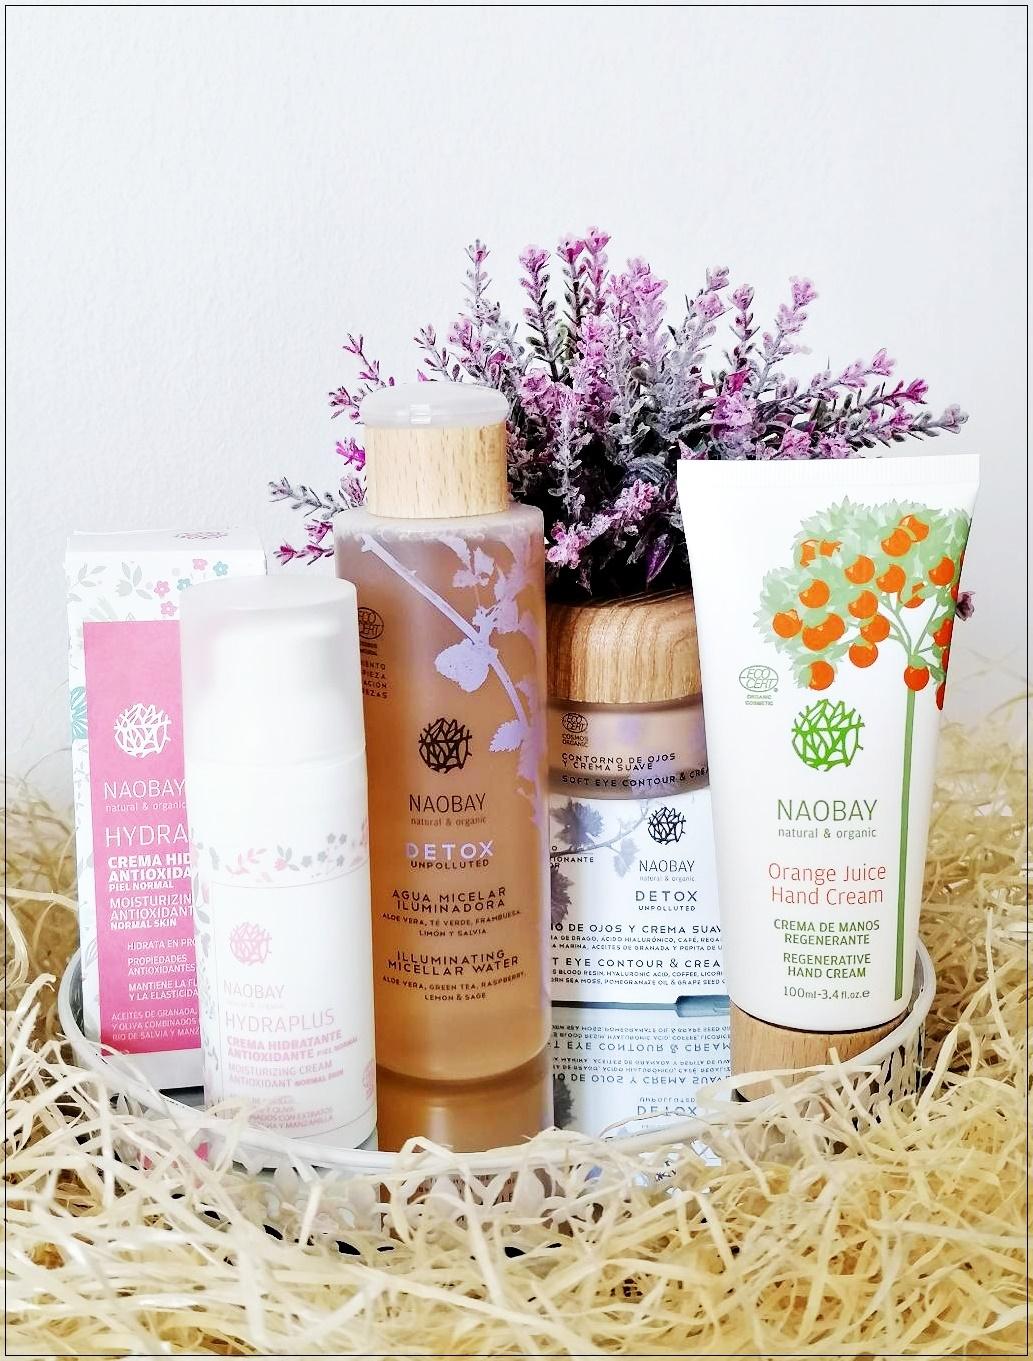 Vine vara: folosesc cosmetice naturale NAOBAY, ideale acestui sezon